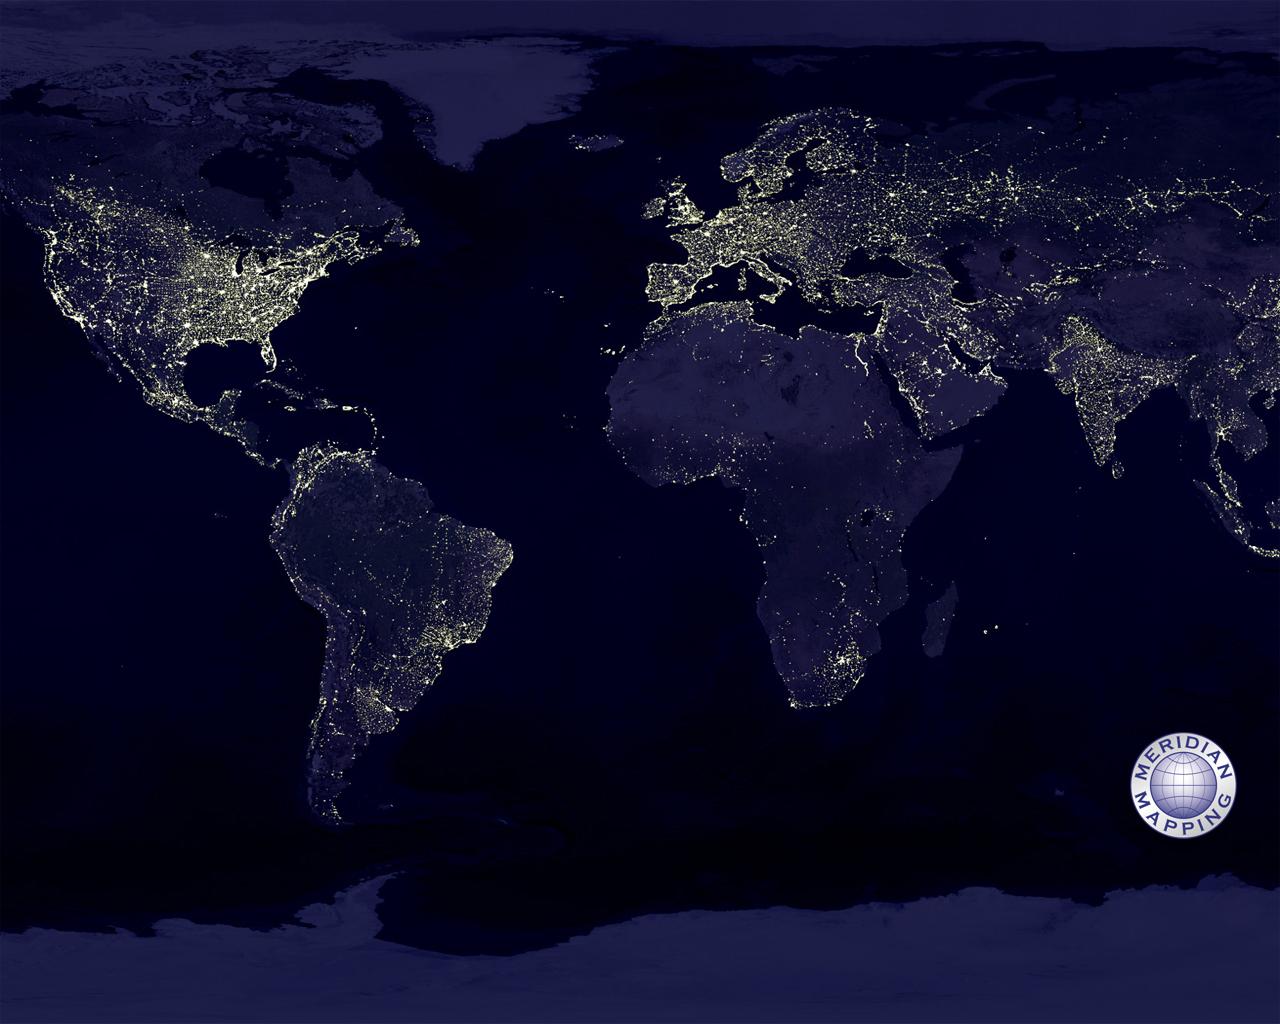 Earth's City Lights 1280x1024